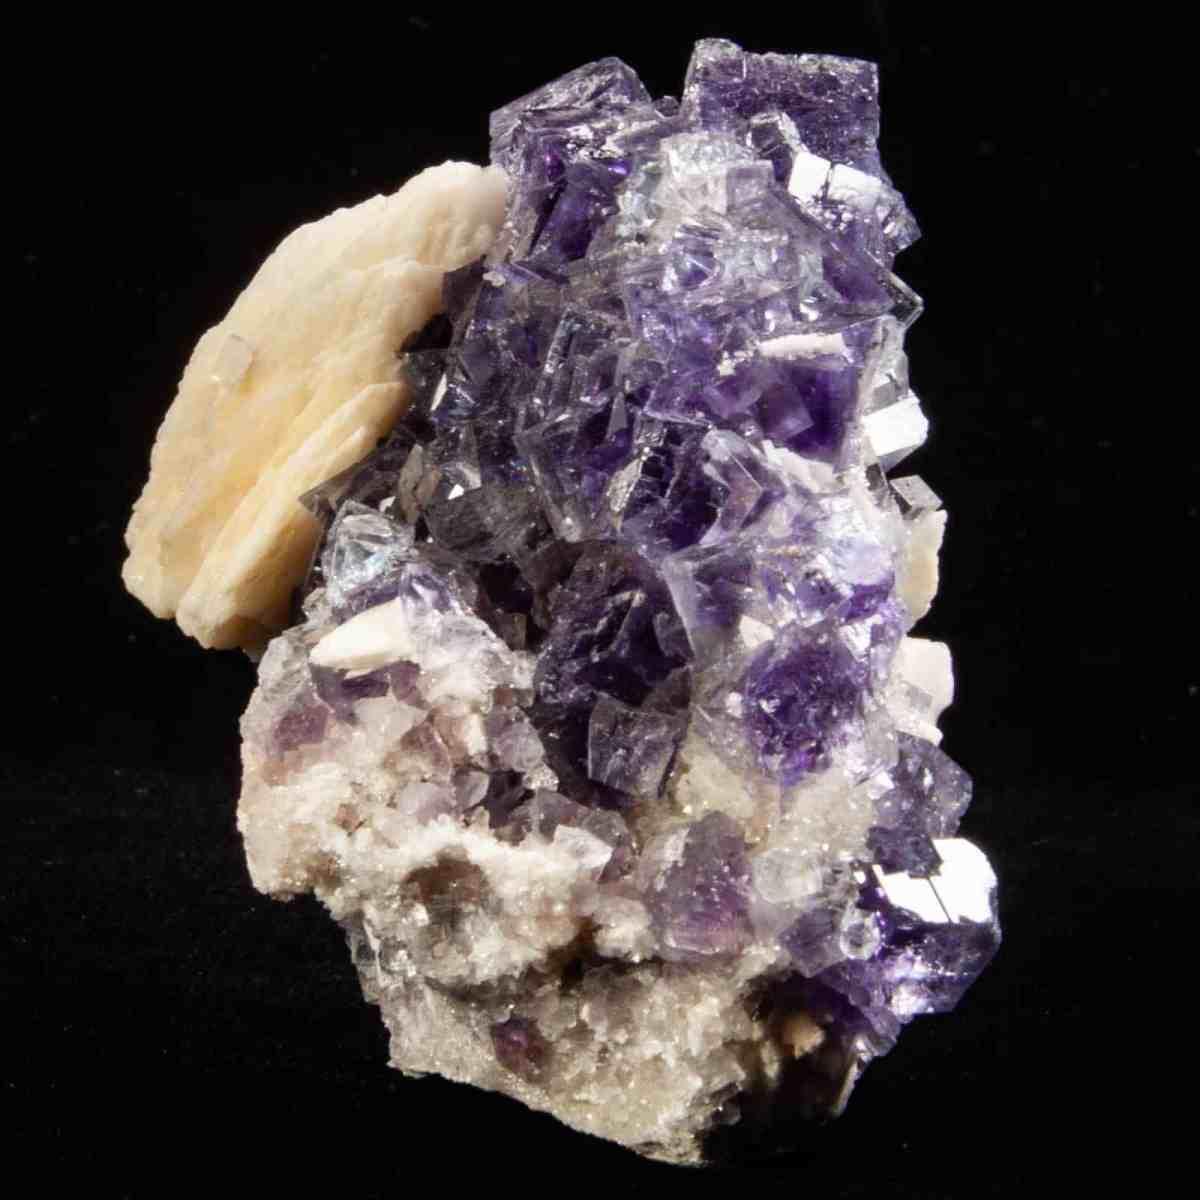 Barite and Fluorite